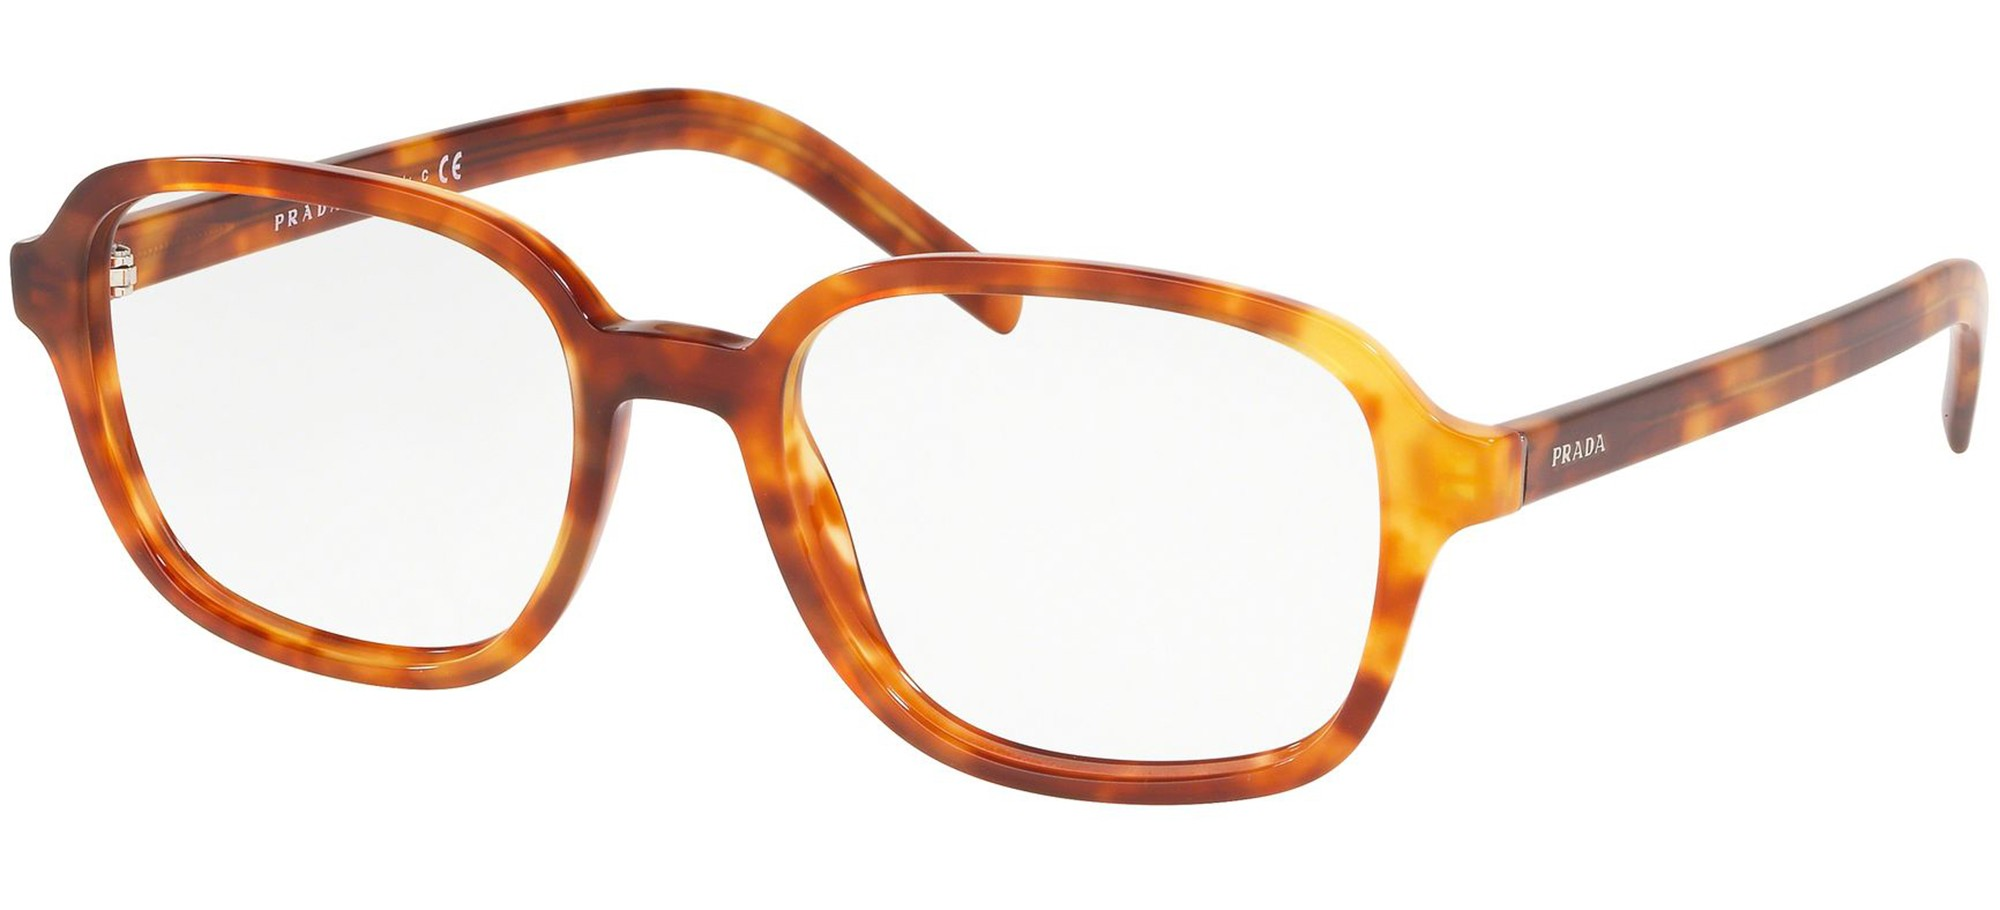 Prada eyeglasses PRADA CORE COLLECTION PR 08XV